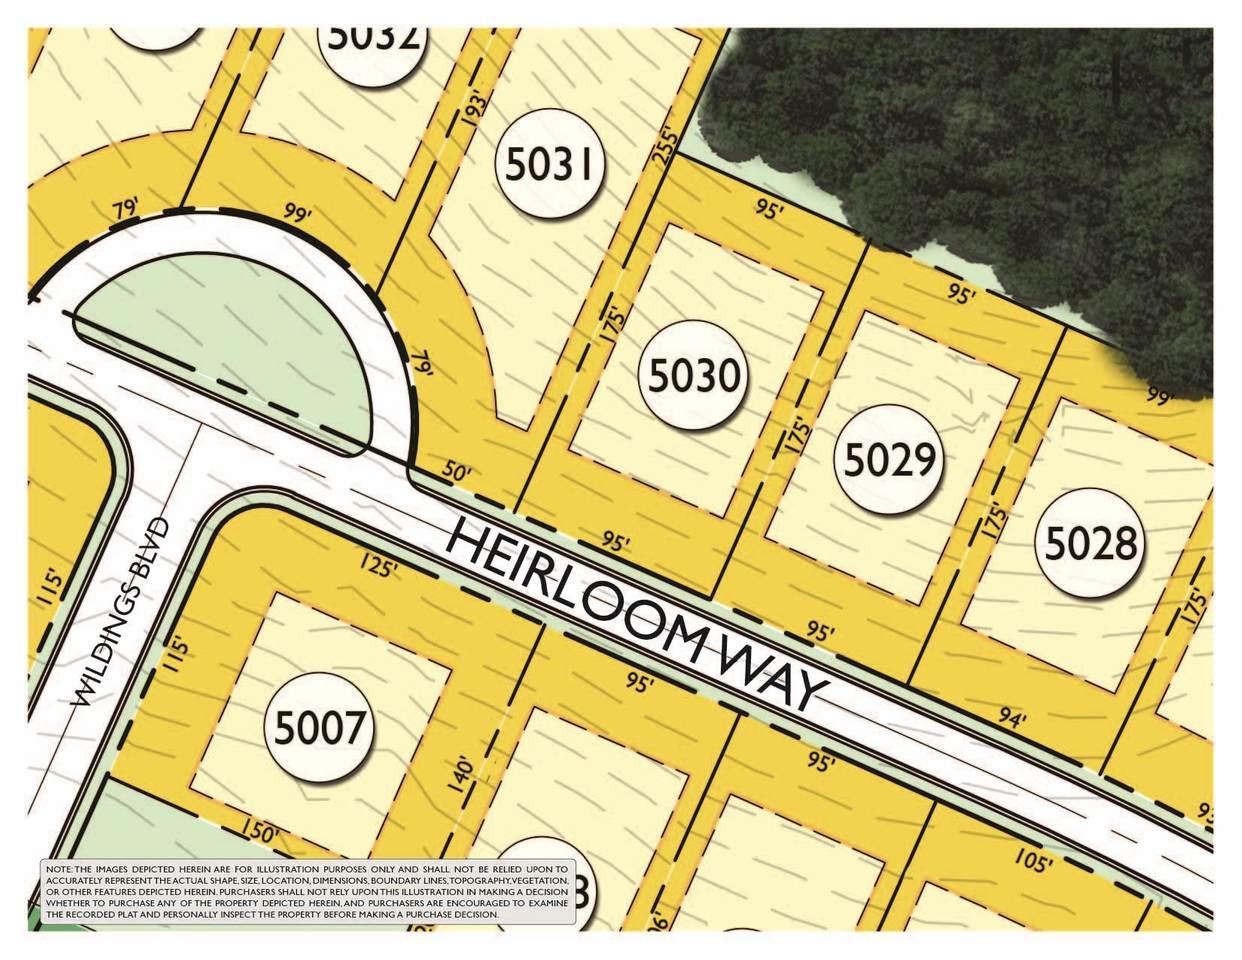 8227 Heirloom Blvd (Lot 5030) - Photo 1